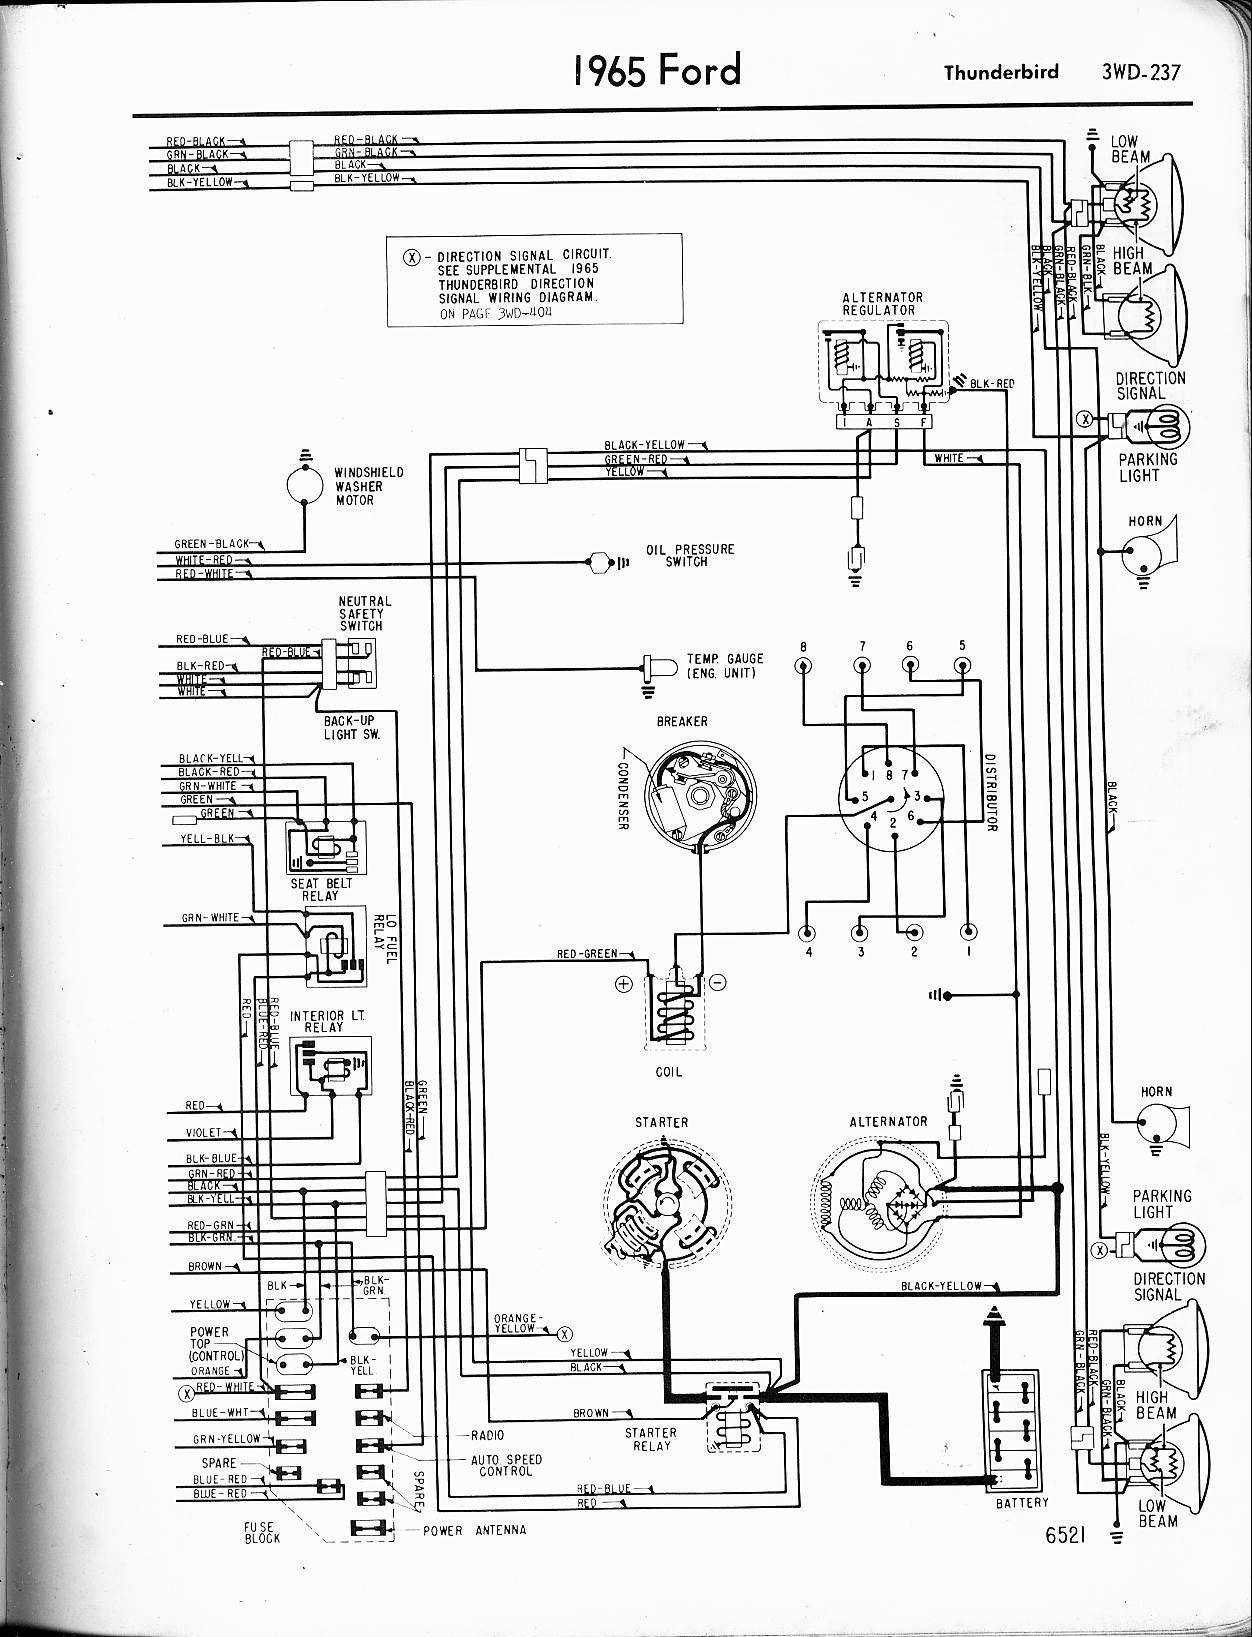 new need wiring diagram diagram wiringdiagram diagramming diagramm visuals visualisation graphical [ 1252 x 1637 Pixel ]